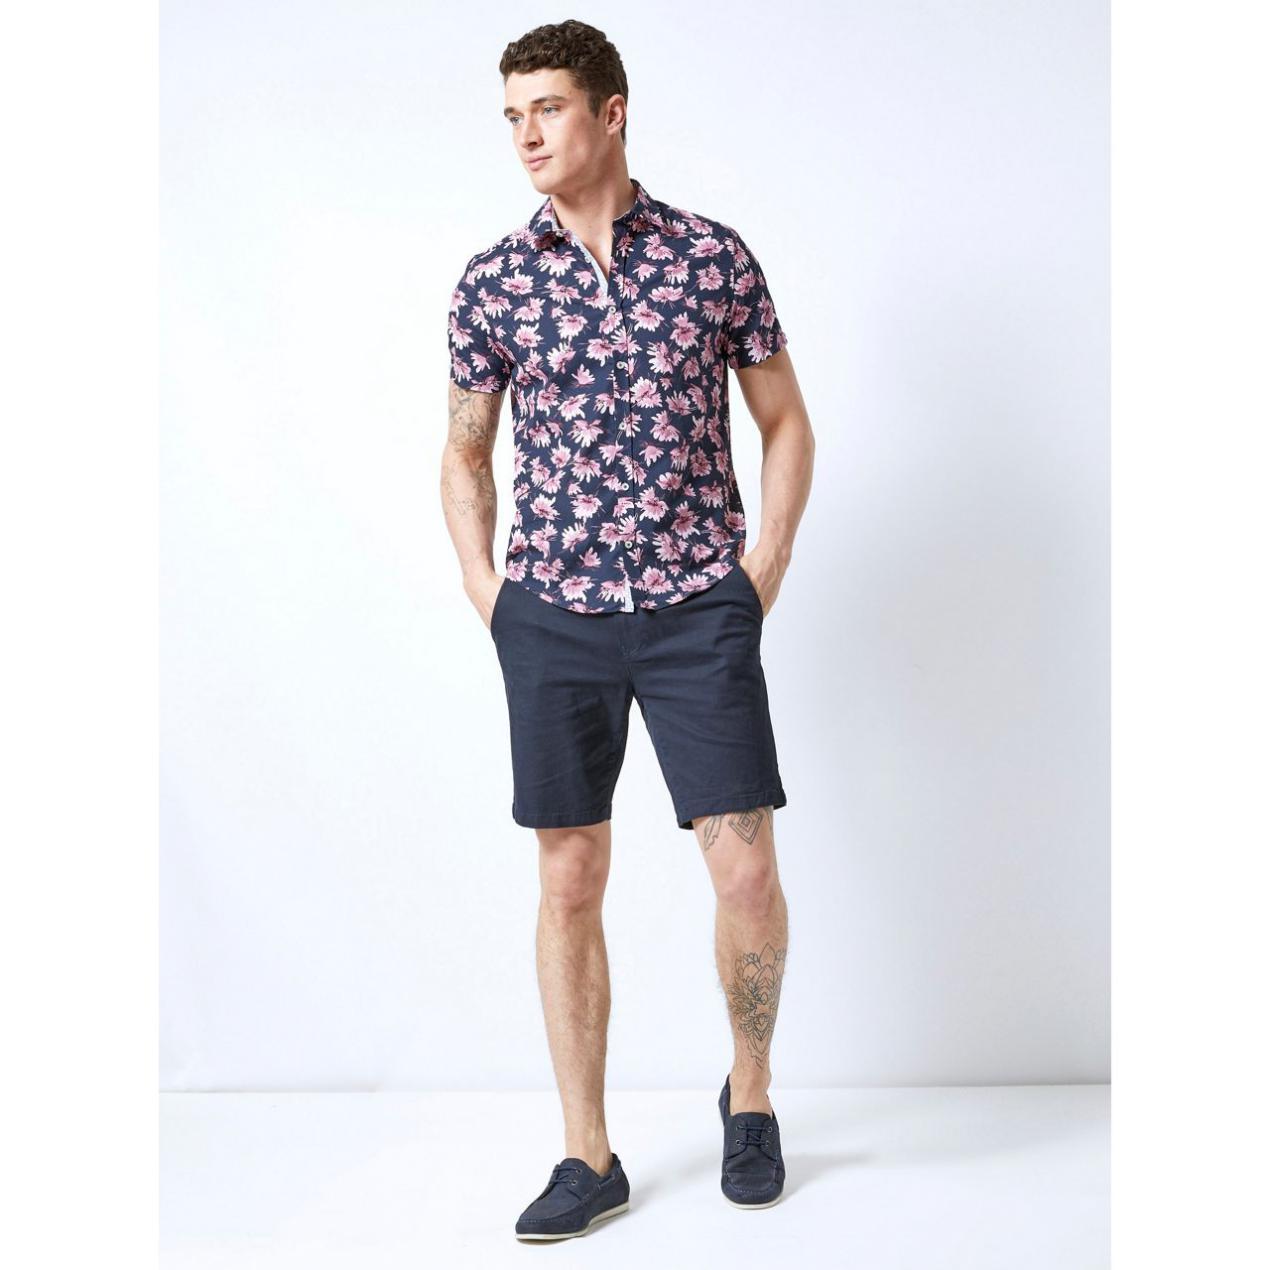 On Slow Navy Floral Print Shirt Pink | Burton Mens Shirts